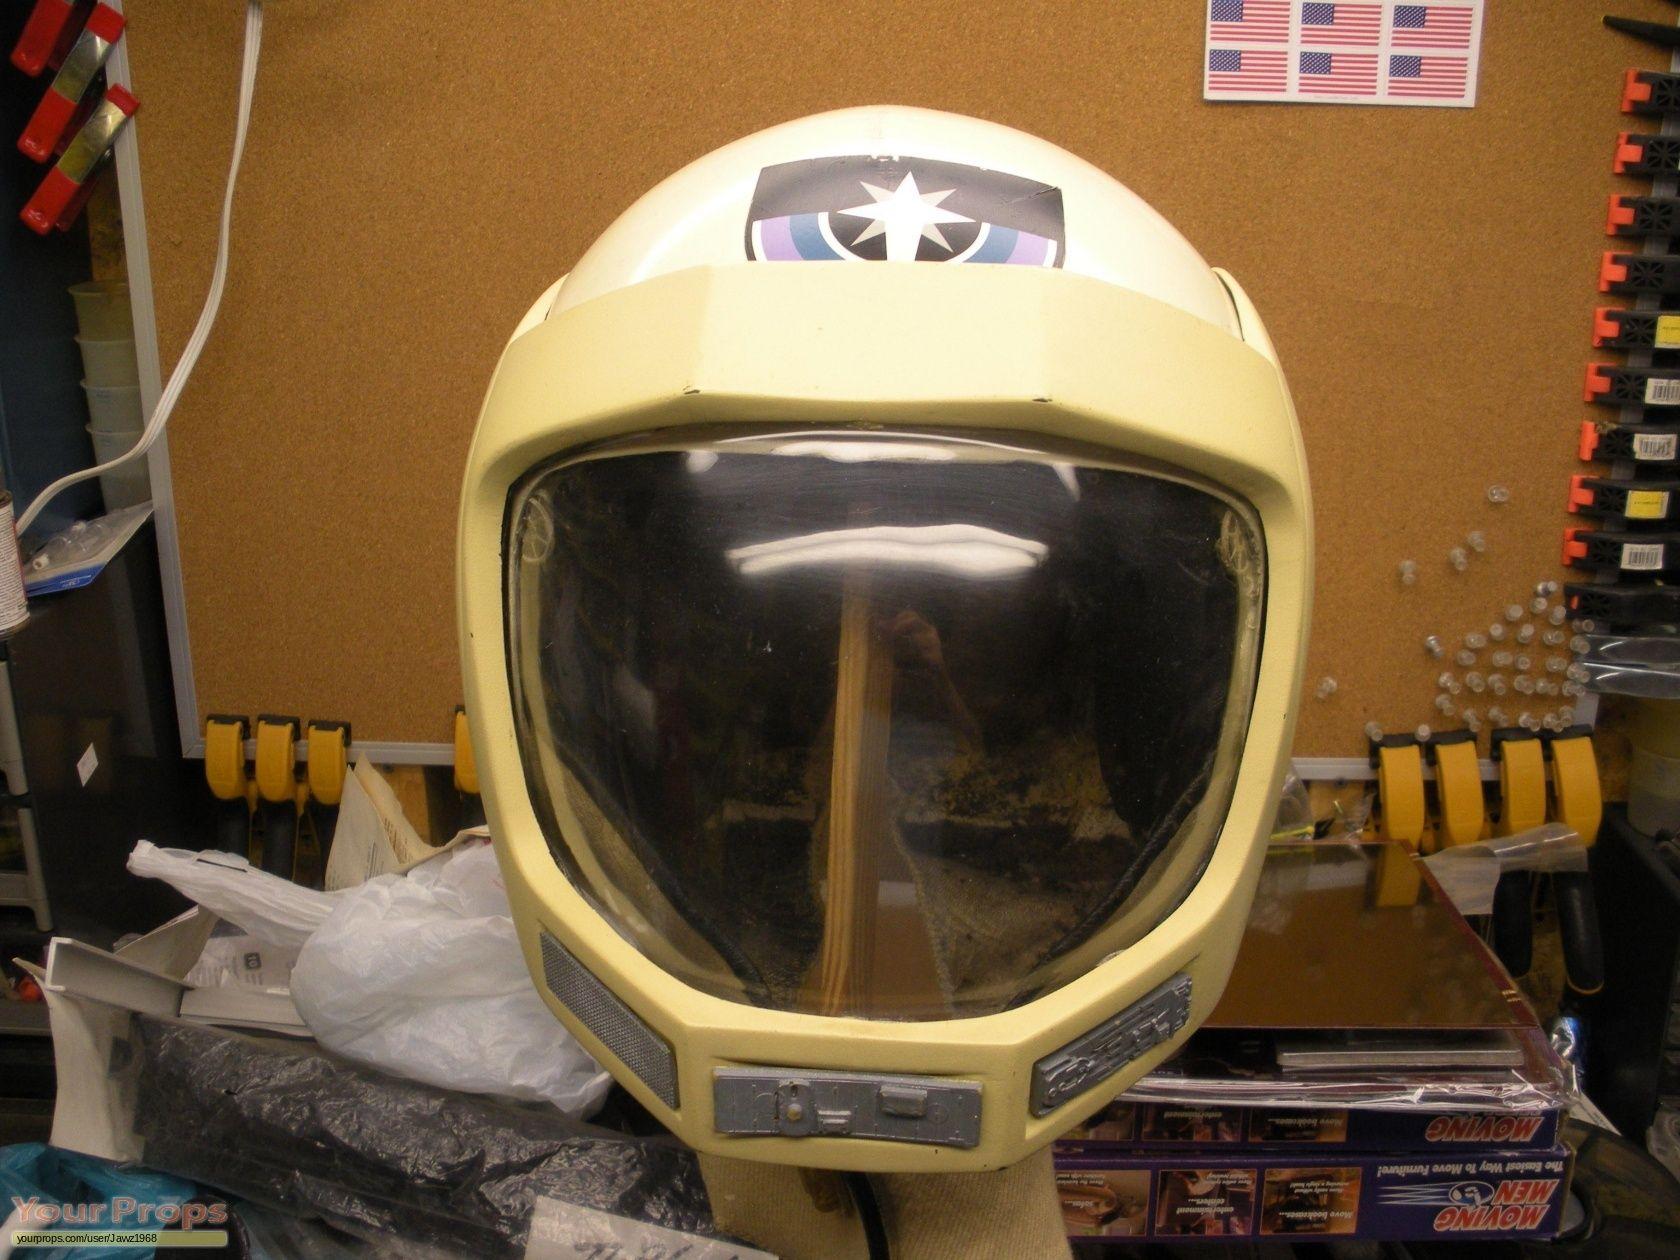 039b0ca54c3 The Last Starfighter Alex Hero space helmet original movie costume ...